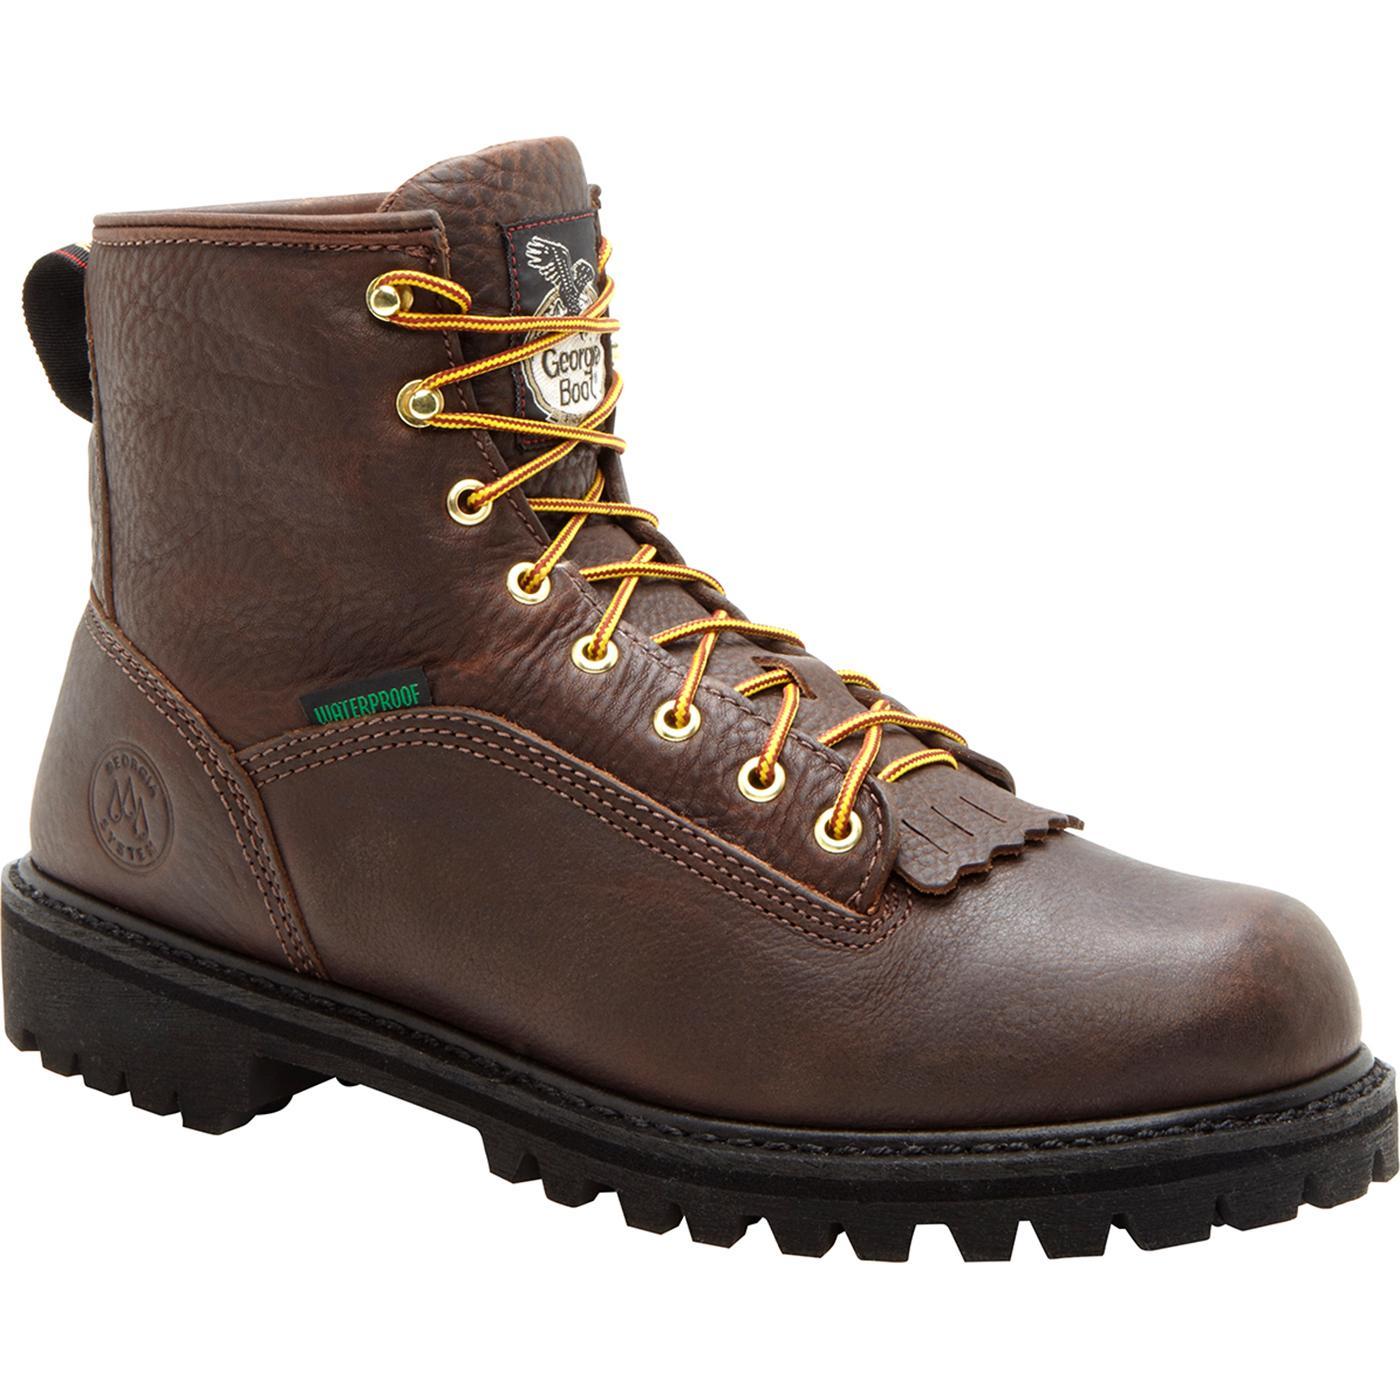 904d6b8b181 Georgia Boot Waterproof Logger Work Boot